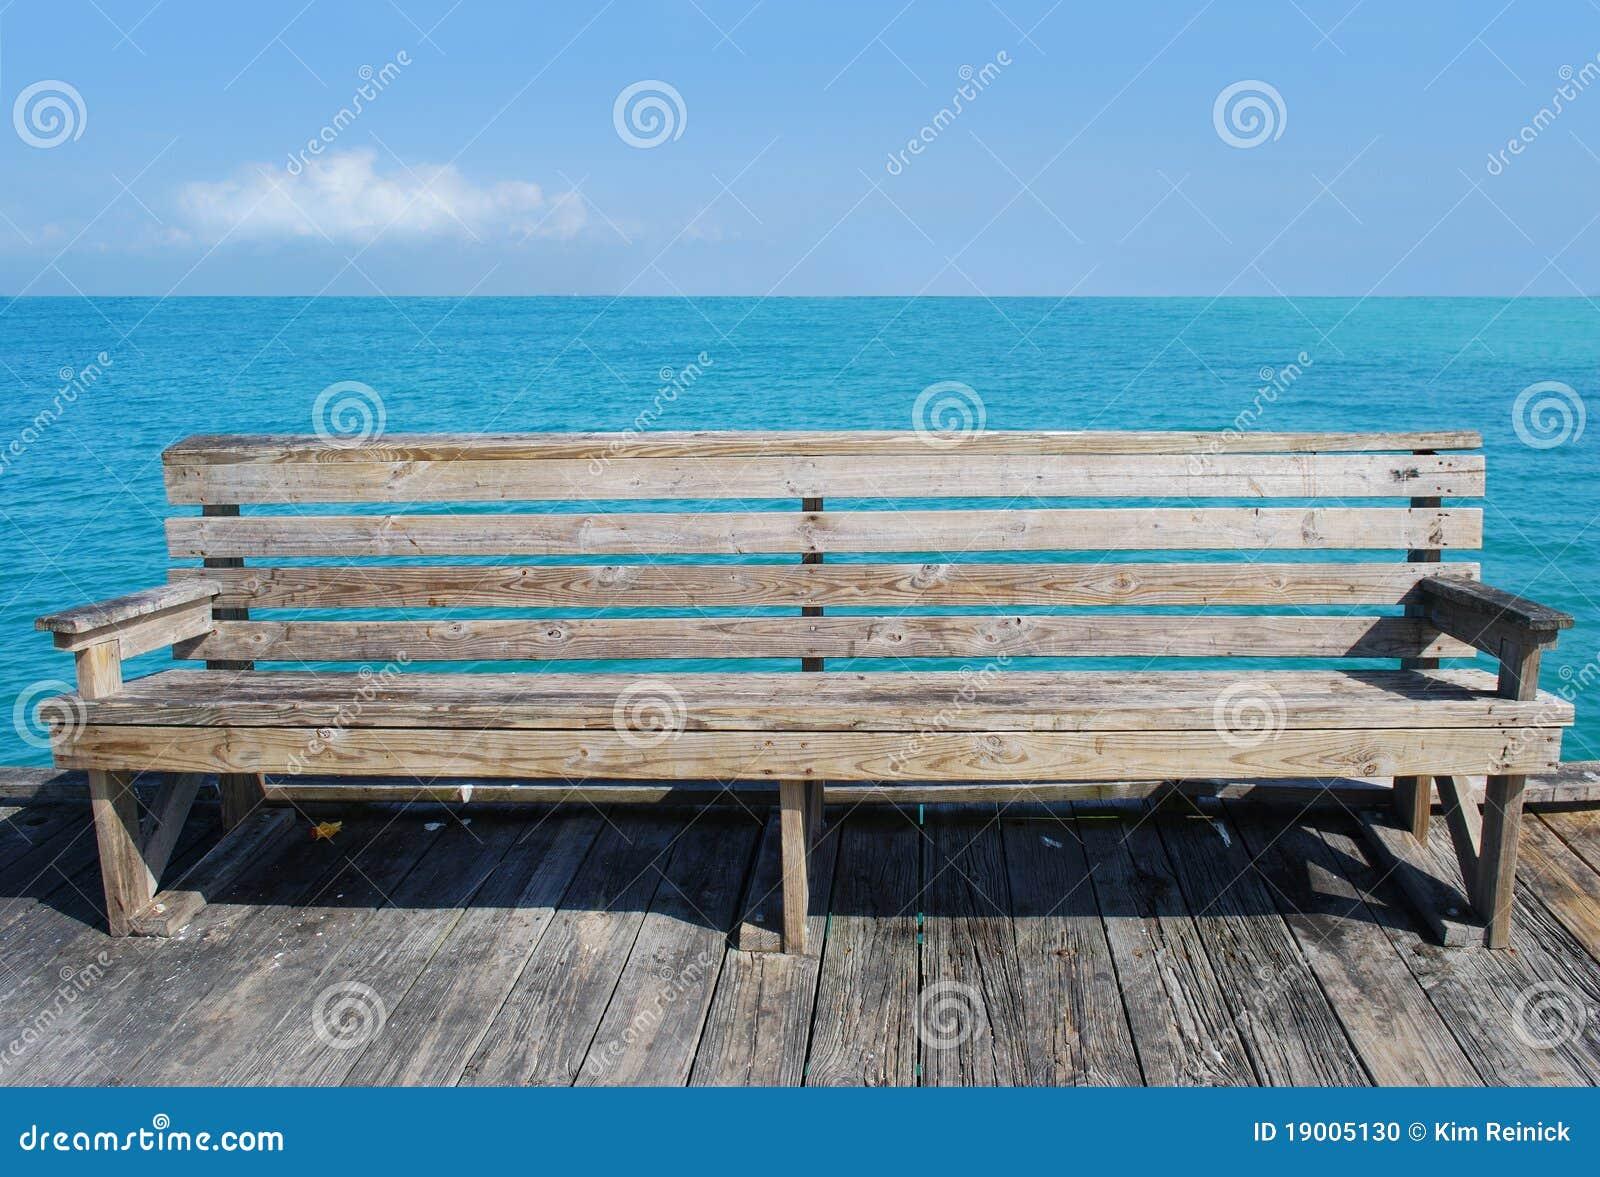 Beach Bench Stock Photo Image 19005130